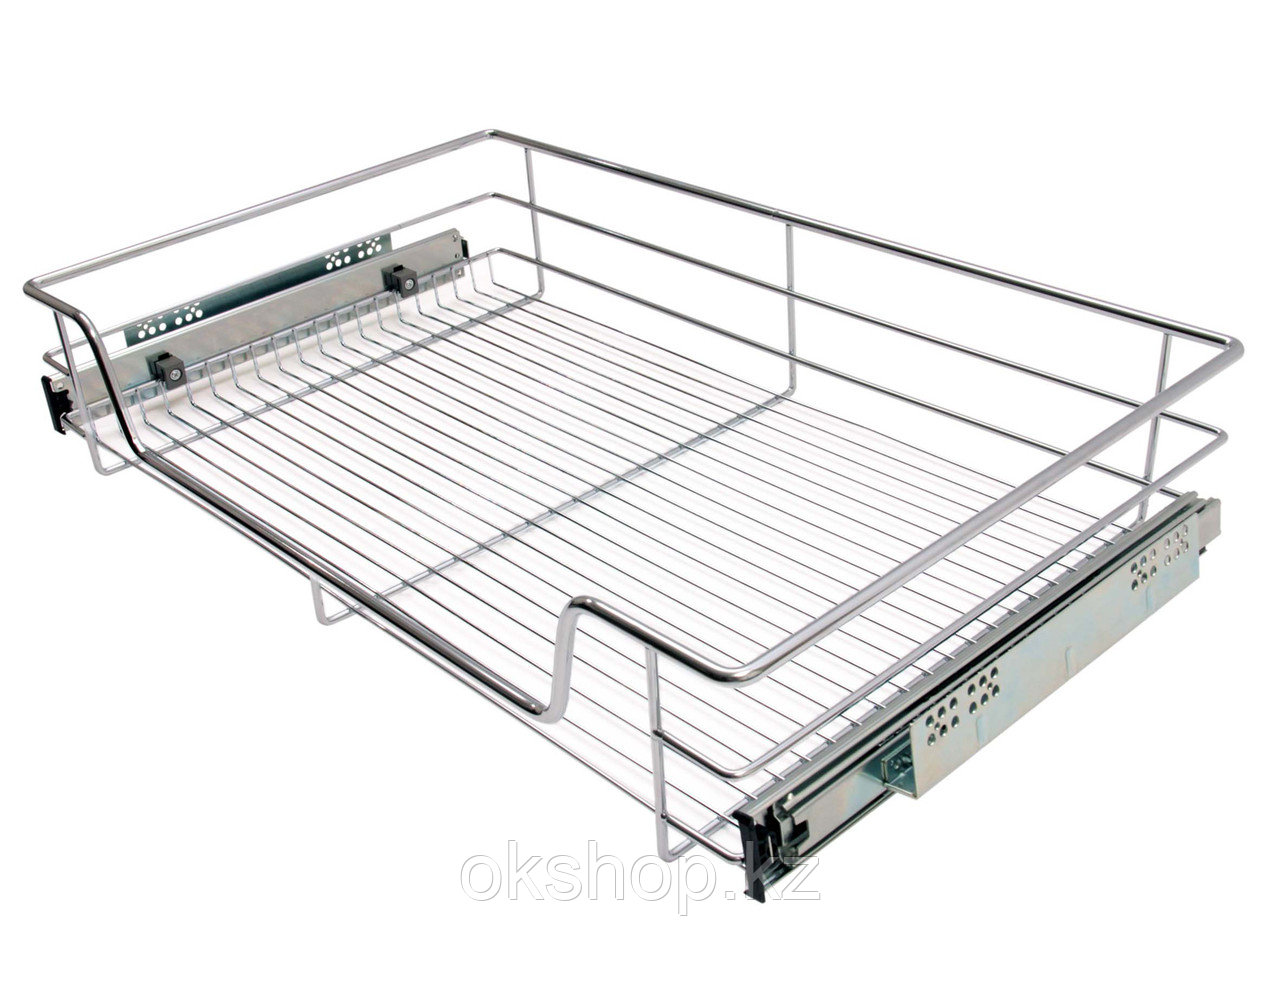 Корзина-сушка для посуды, корзина для шкафа купе KRS04/1/1/800